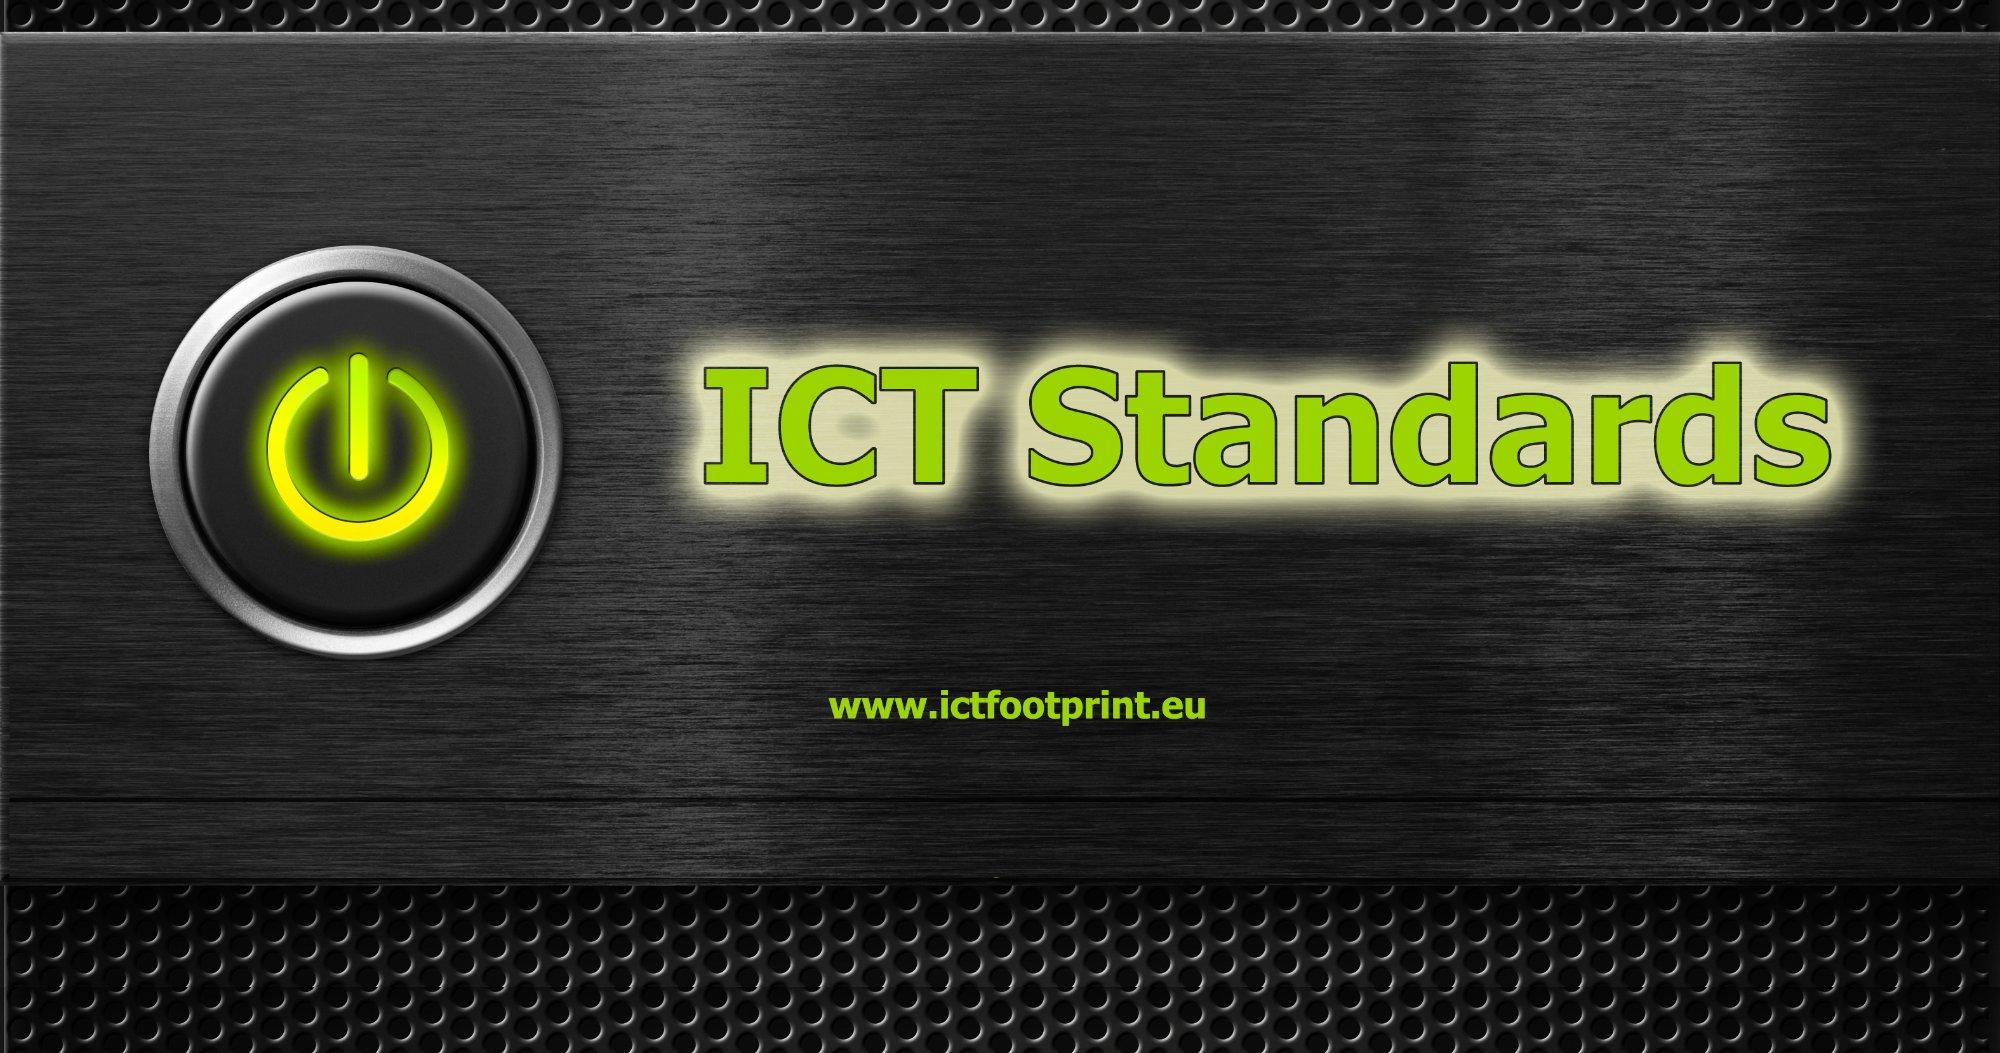 ict_standards